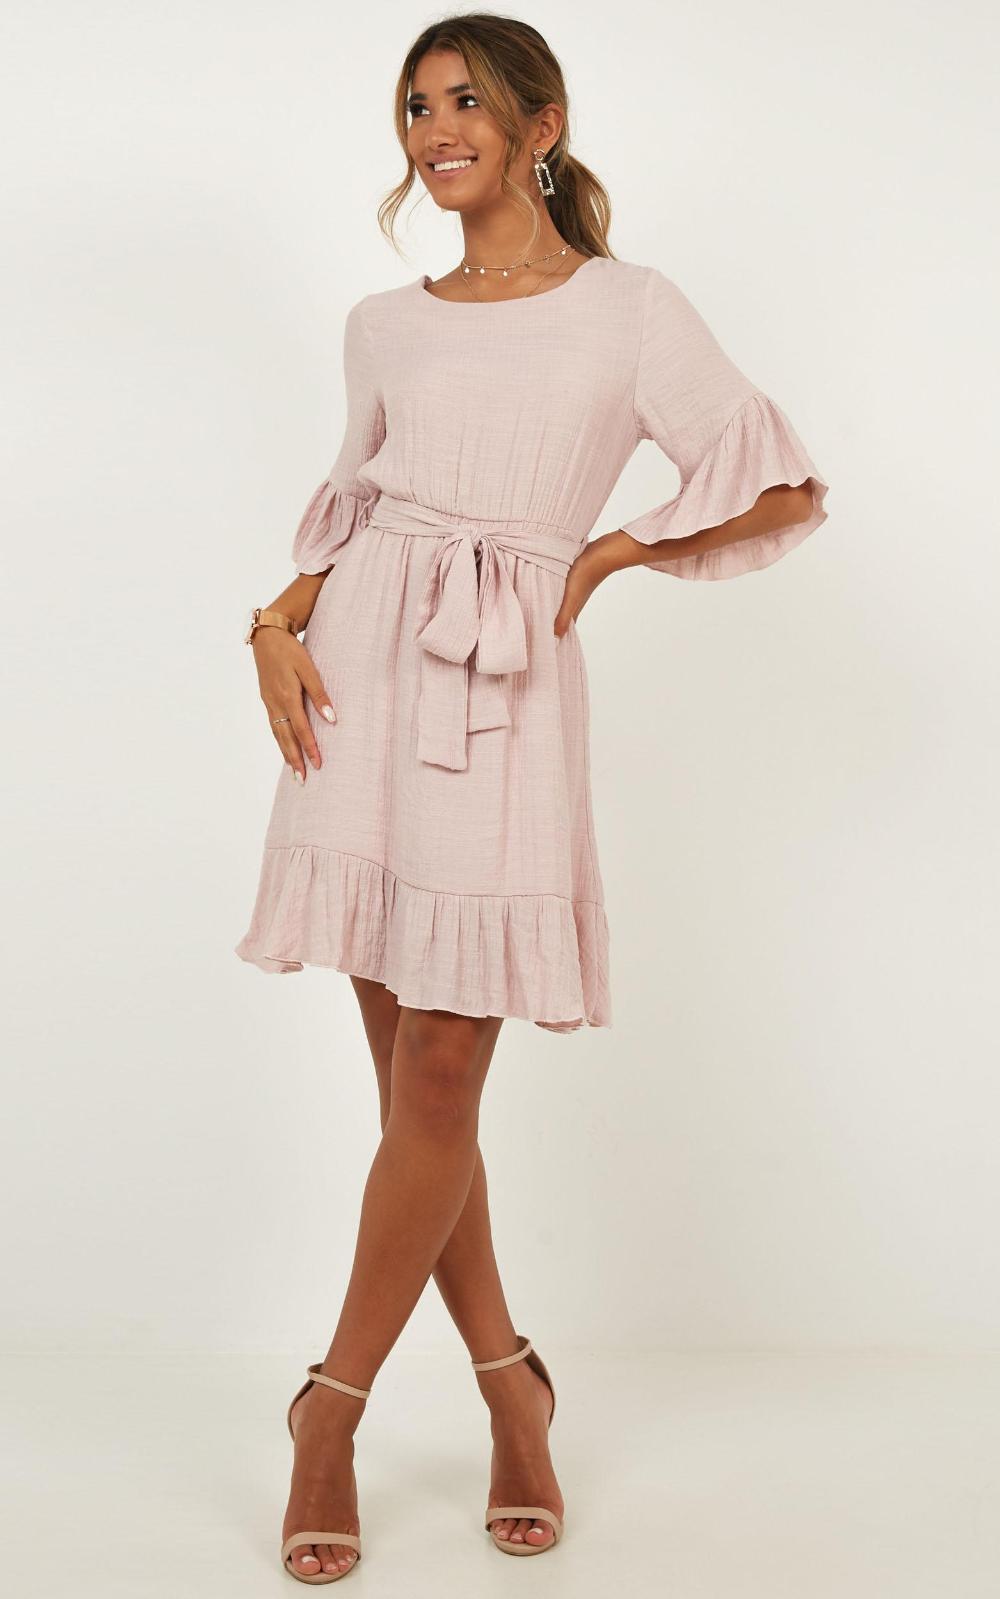 Pin Von Chrissy Csangel Auf Elegant Dresses Bouses To Buy